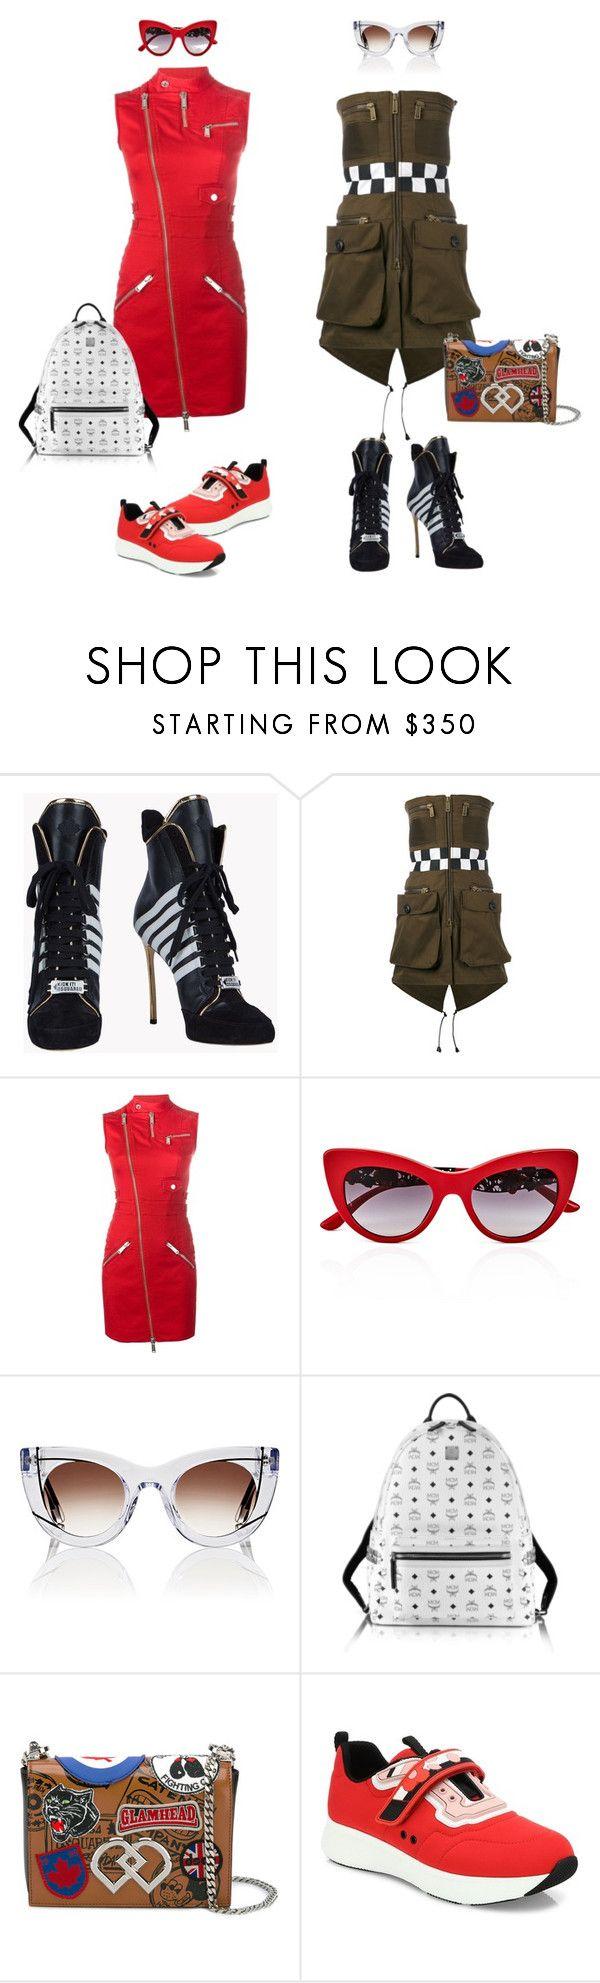 """Мини-платья от Dsquared2"" by repriza on Polyvore featuring мода, Dsquared2, Dolce&Gabbana, Thierry Lasry, MCM и Prada"